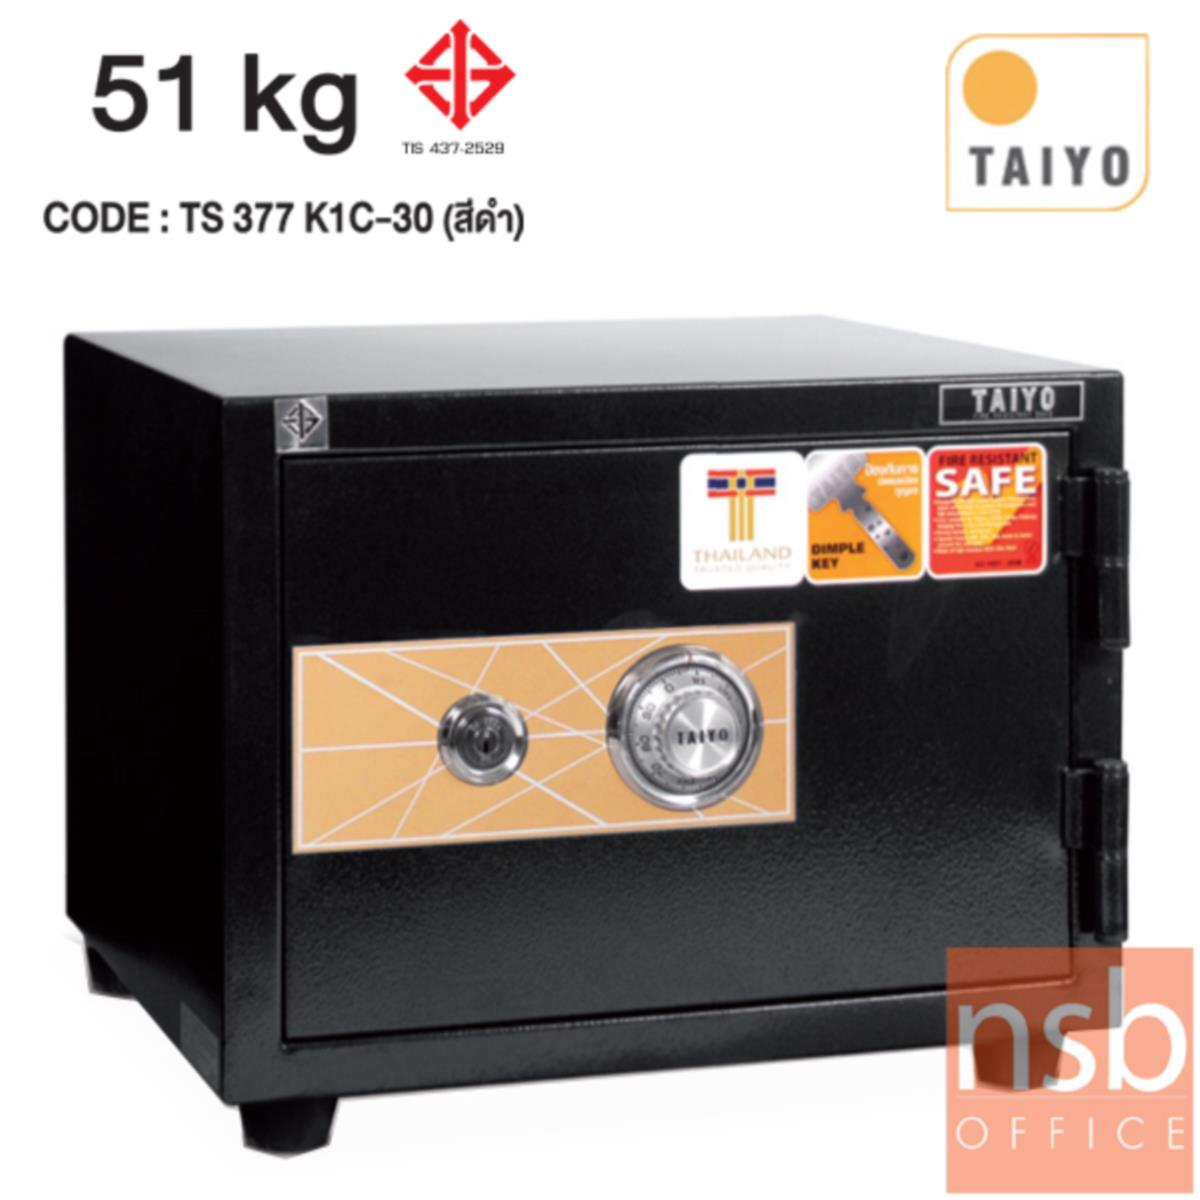 F01A056:ตู้เซฟ TAIYO 51 กก. 1 กุญแจ 1 รหัส (TS 377 K1C-30) สีดำ